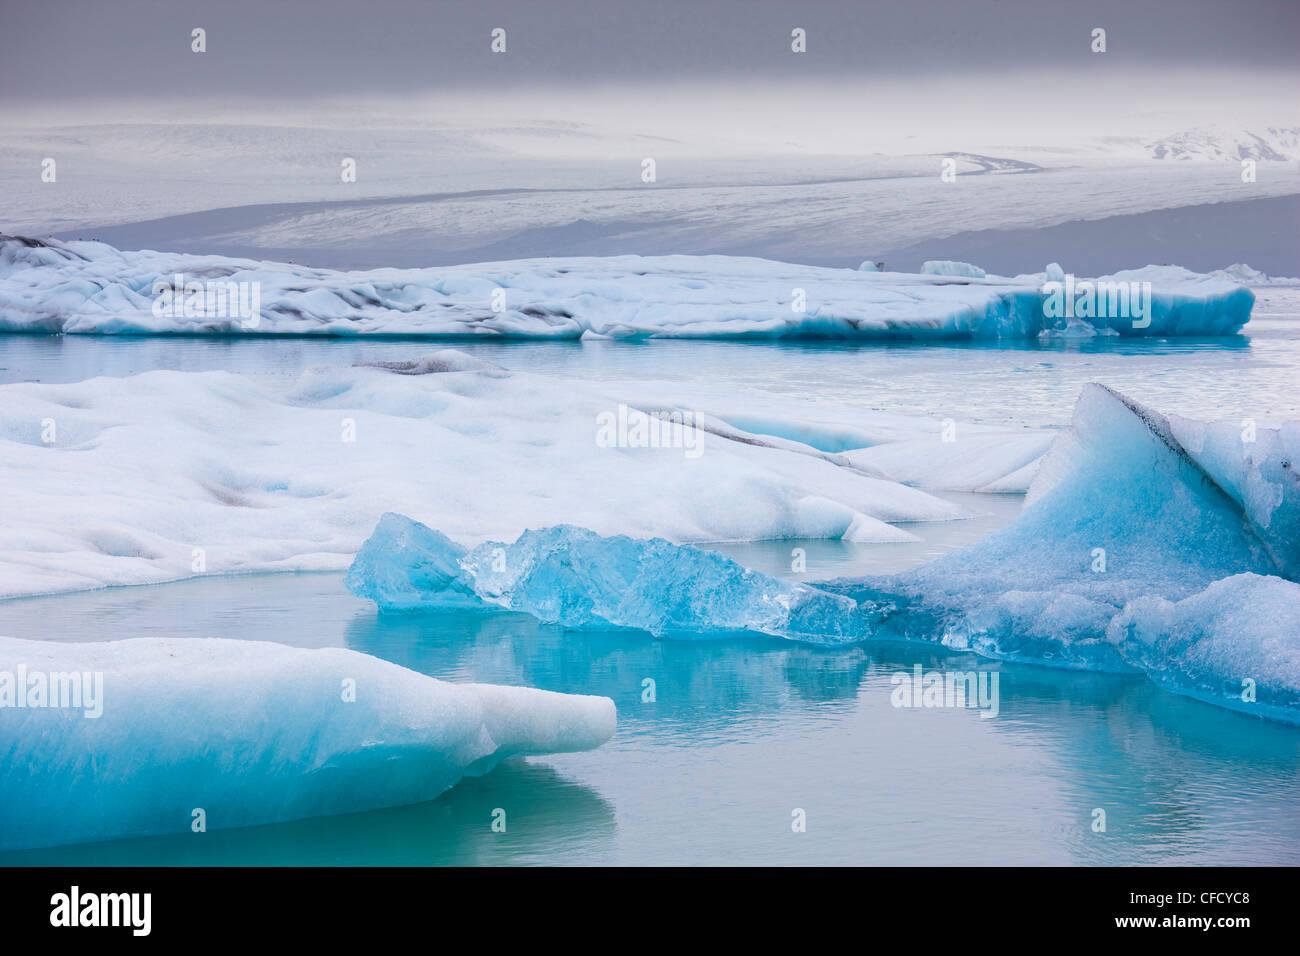 Icebergs,on the Jokulsarlon glacial lagoon, Iceland, Polar Regions - Stock Image